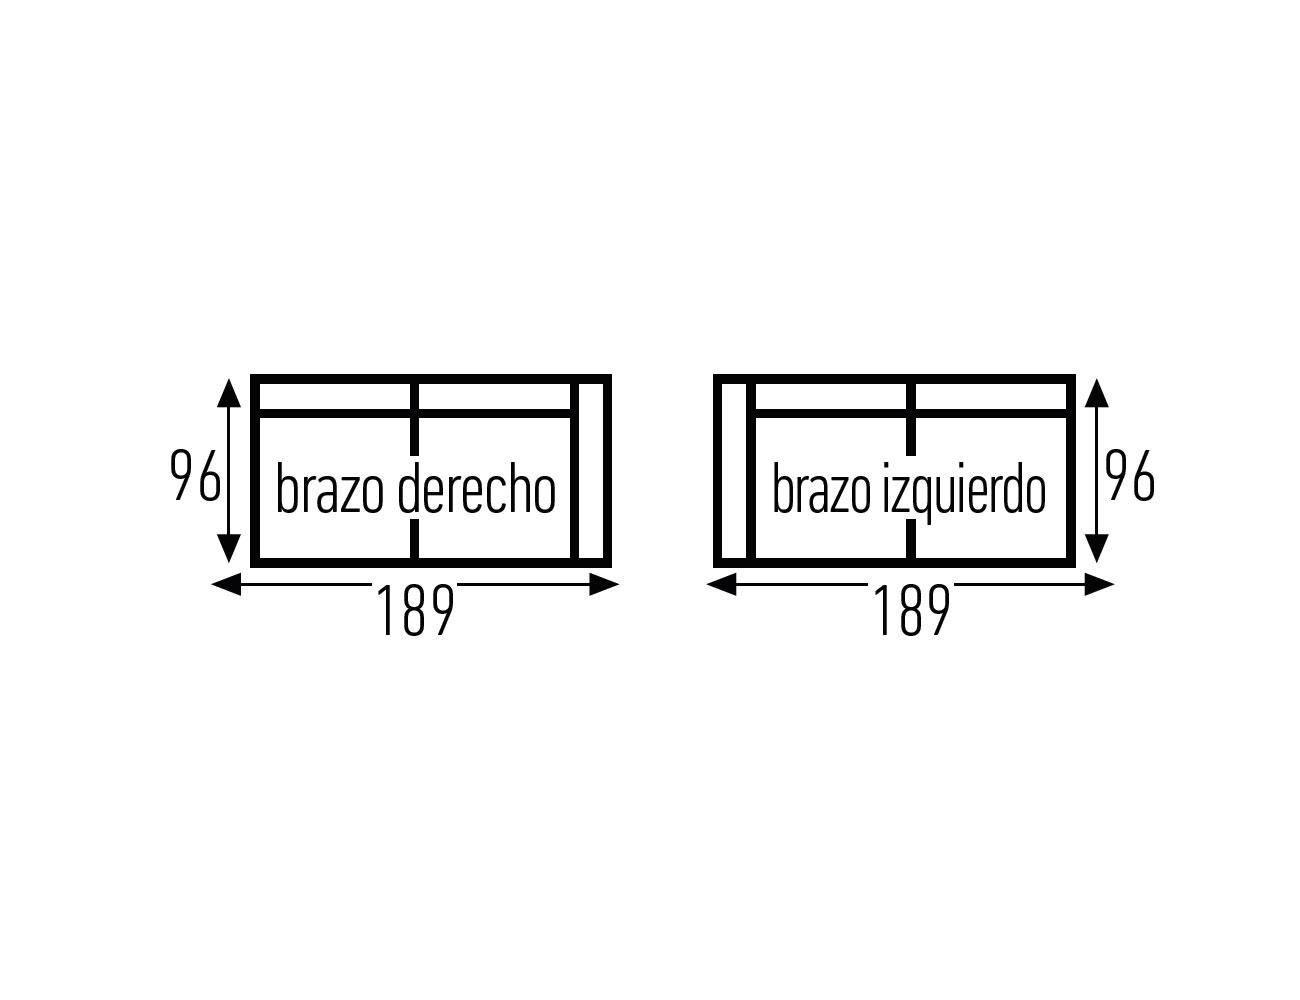 Croquis 3p sin 1 brazo 18916